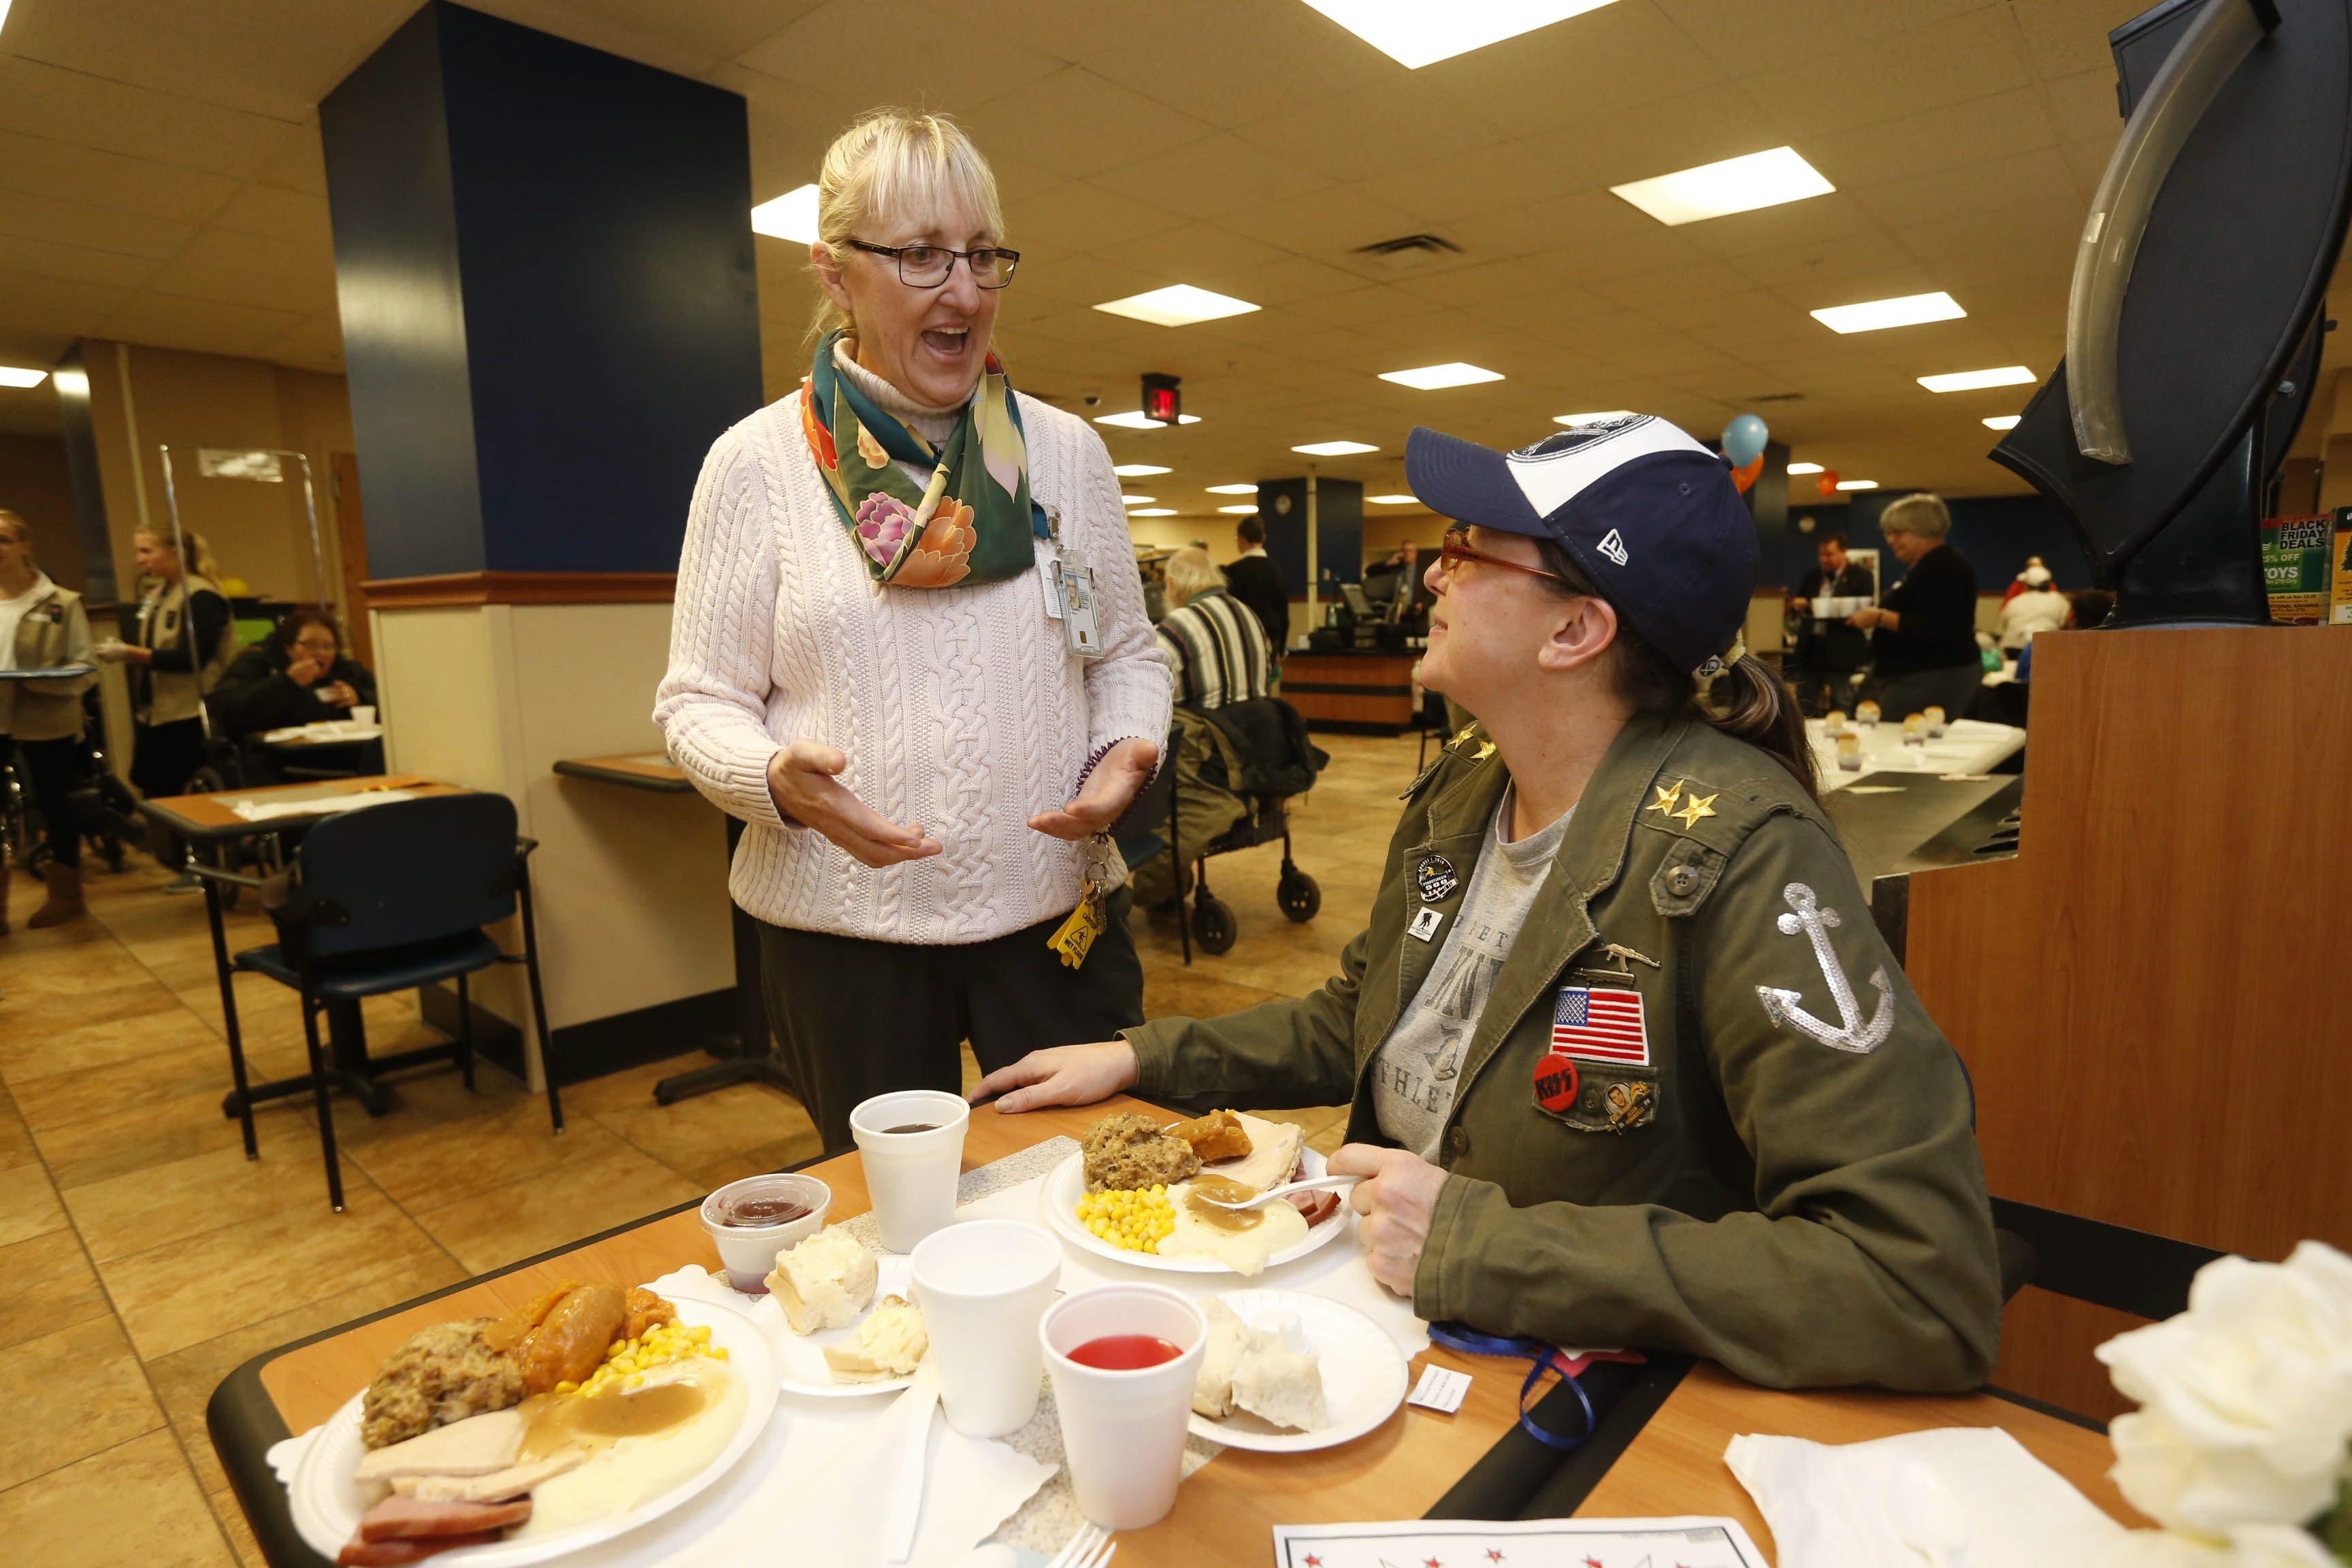 Judith Kaczmarek visits with Elizabeth Demler, a Navy veteran, right, during a Thanksgiving dinner in the cafeteria of the VA Hospital last November. (Robert Kirkham/Buffalo News file photo)